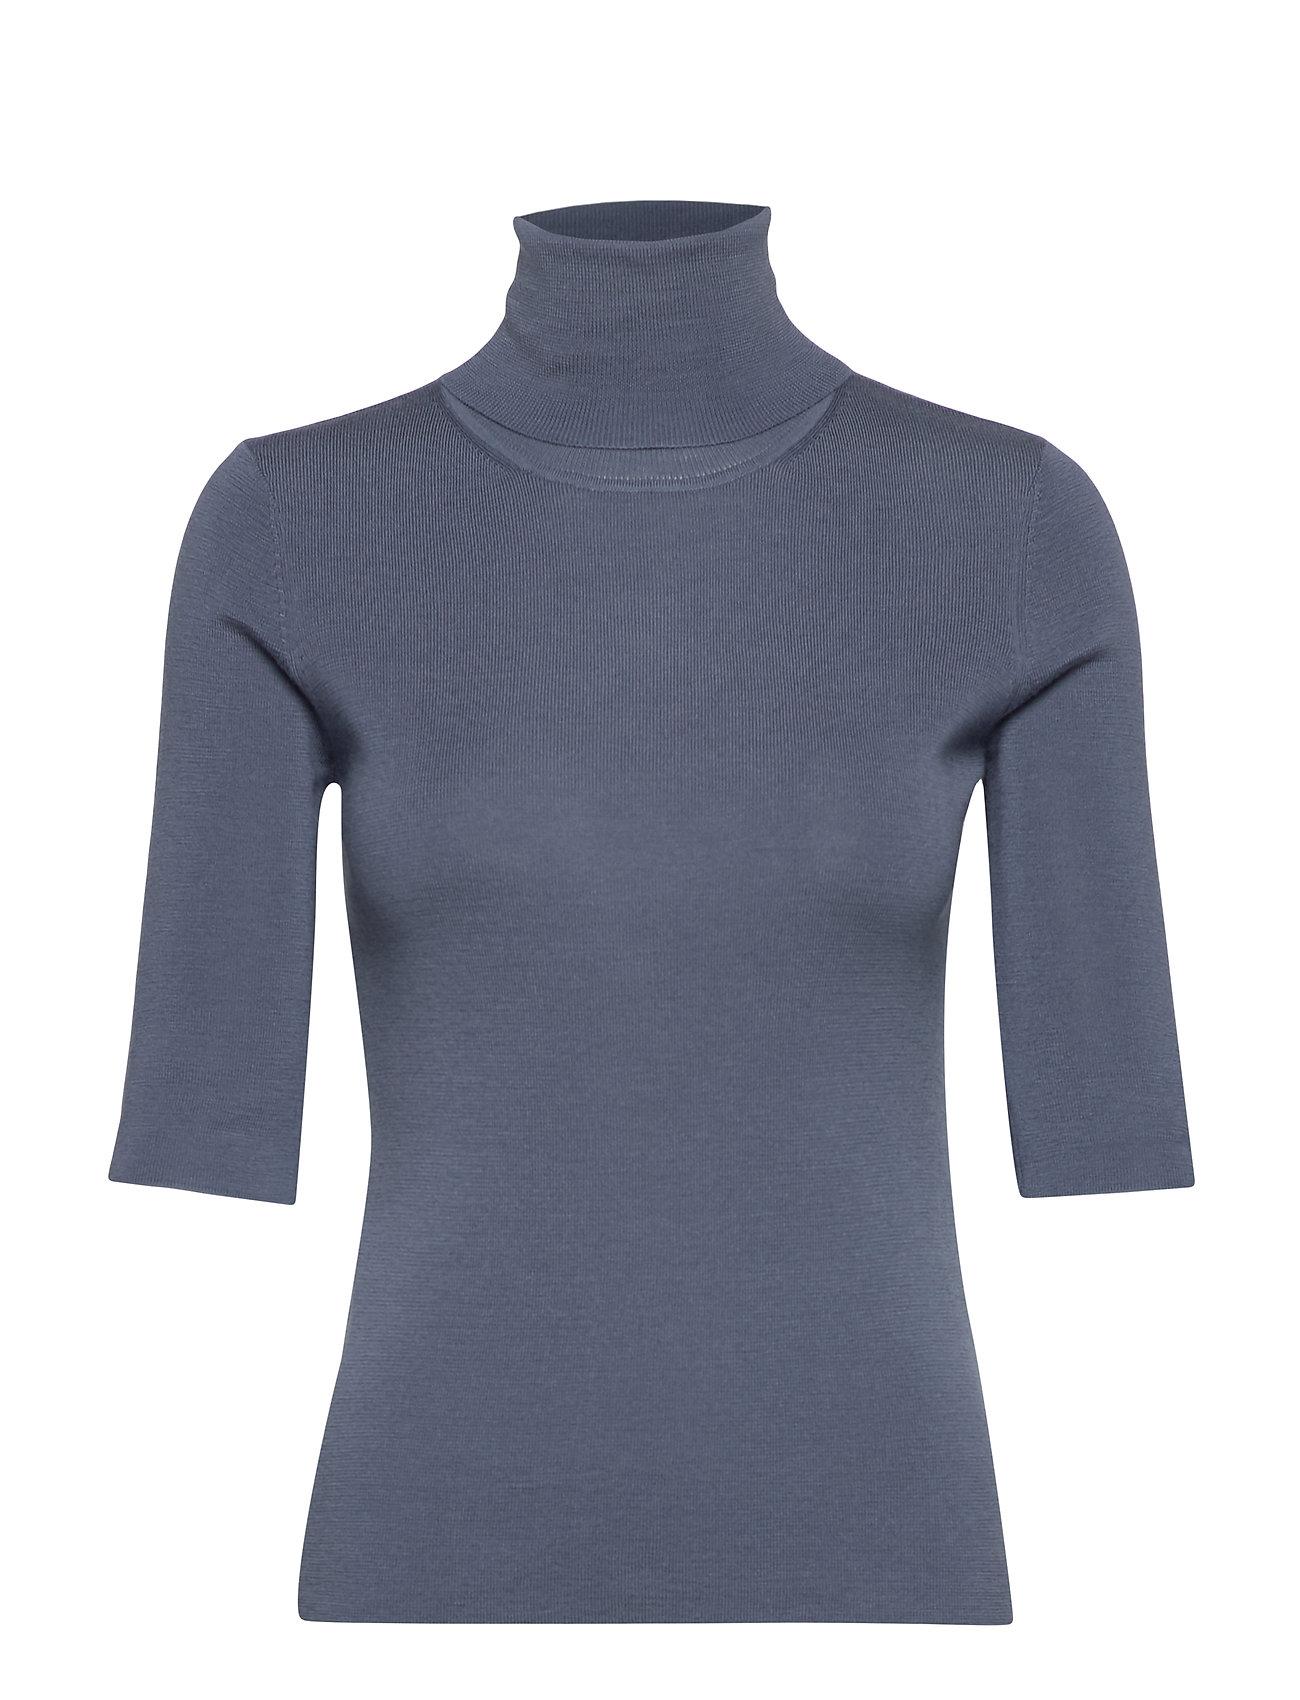 Filippa K Merino Elbow Sleeve Top - BLUE GREY